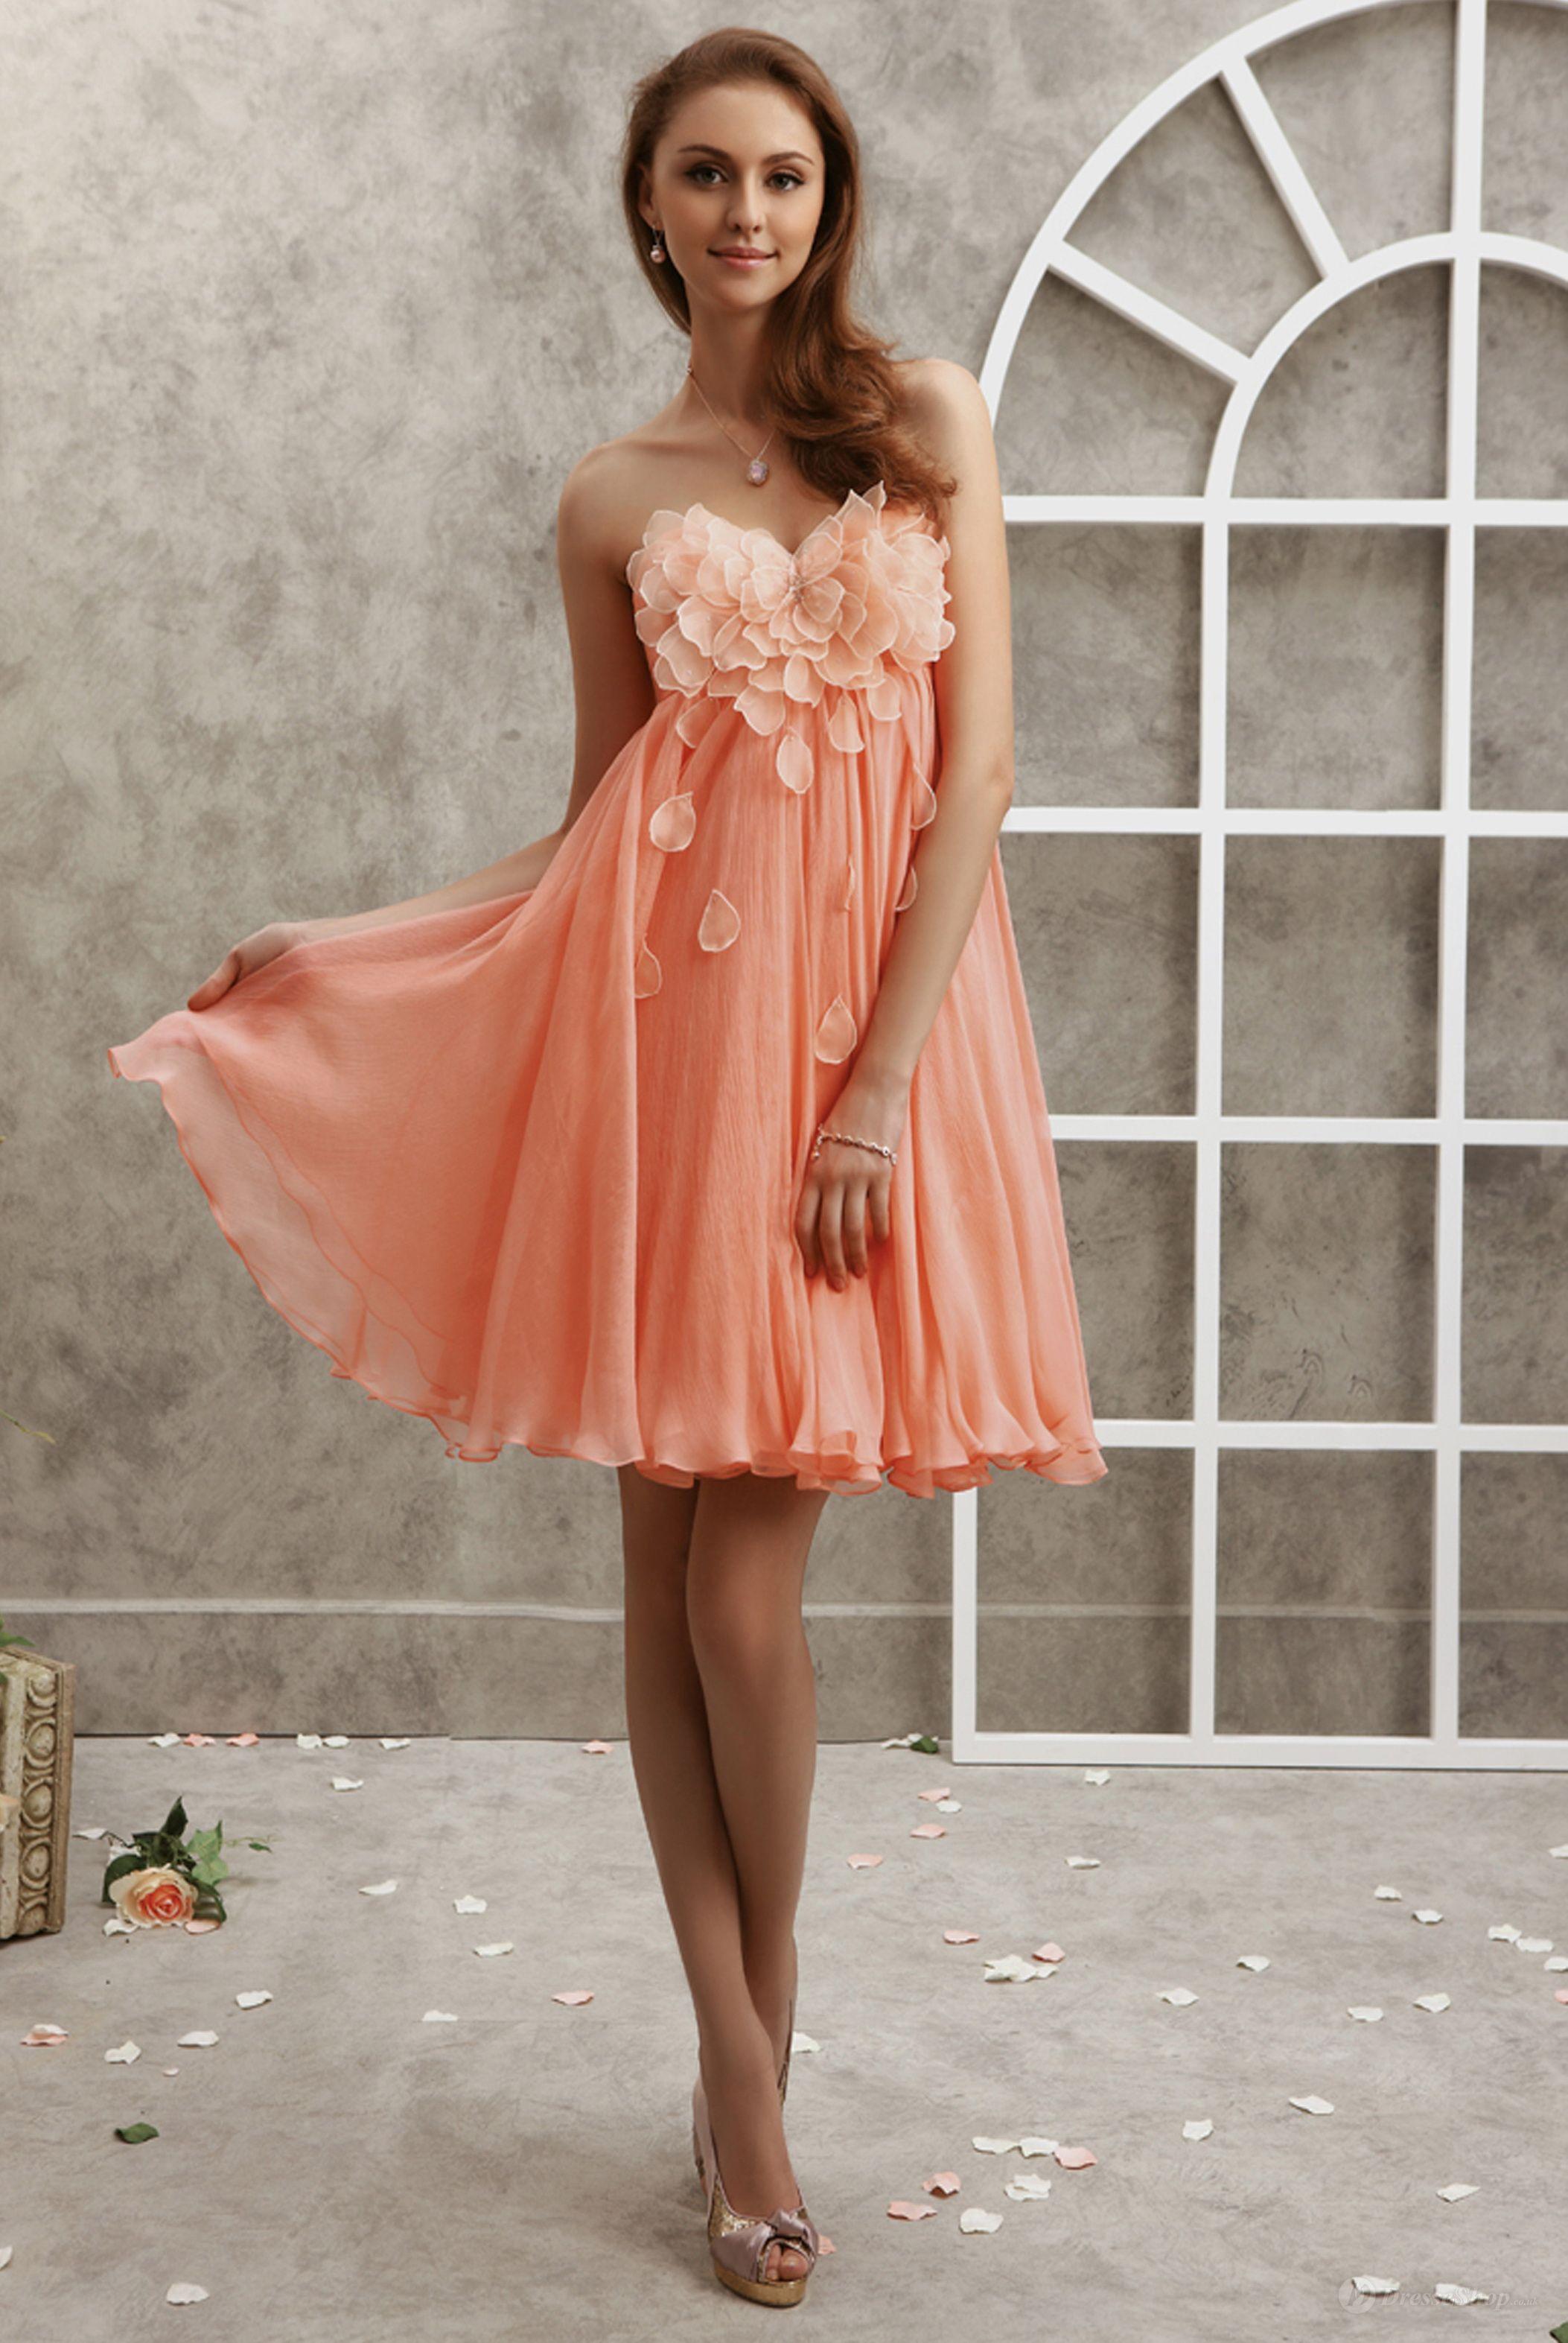 Empire Sweetheart Flower Petal Chiffon Short/Mini Dress - possible ...